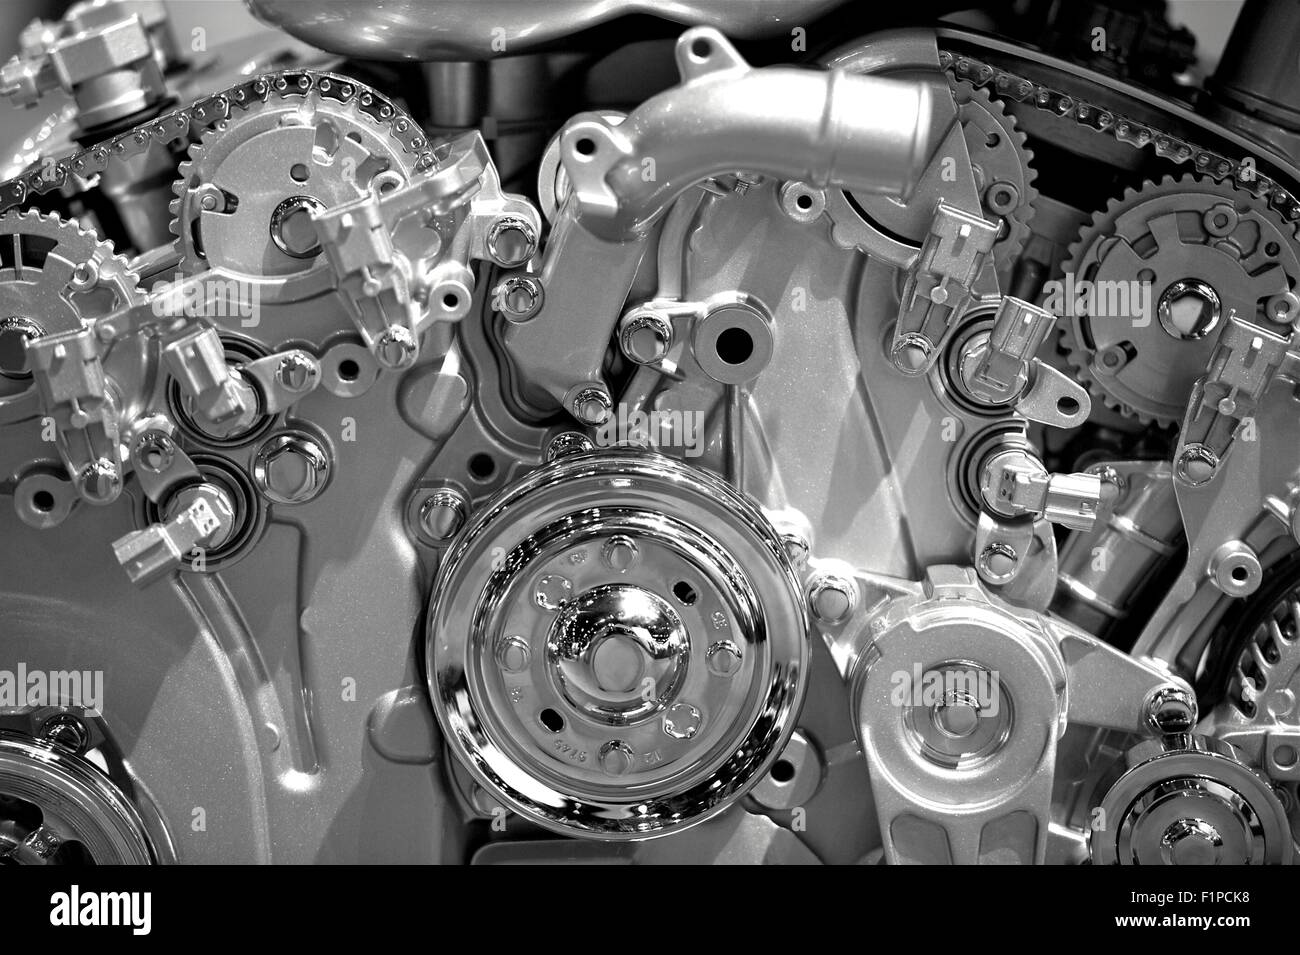 Modern Gasoline Engine Technology Metal Shiny Car Engine Closeup Stock Photo Alamy